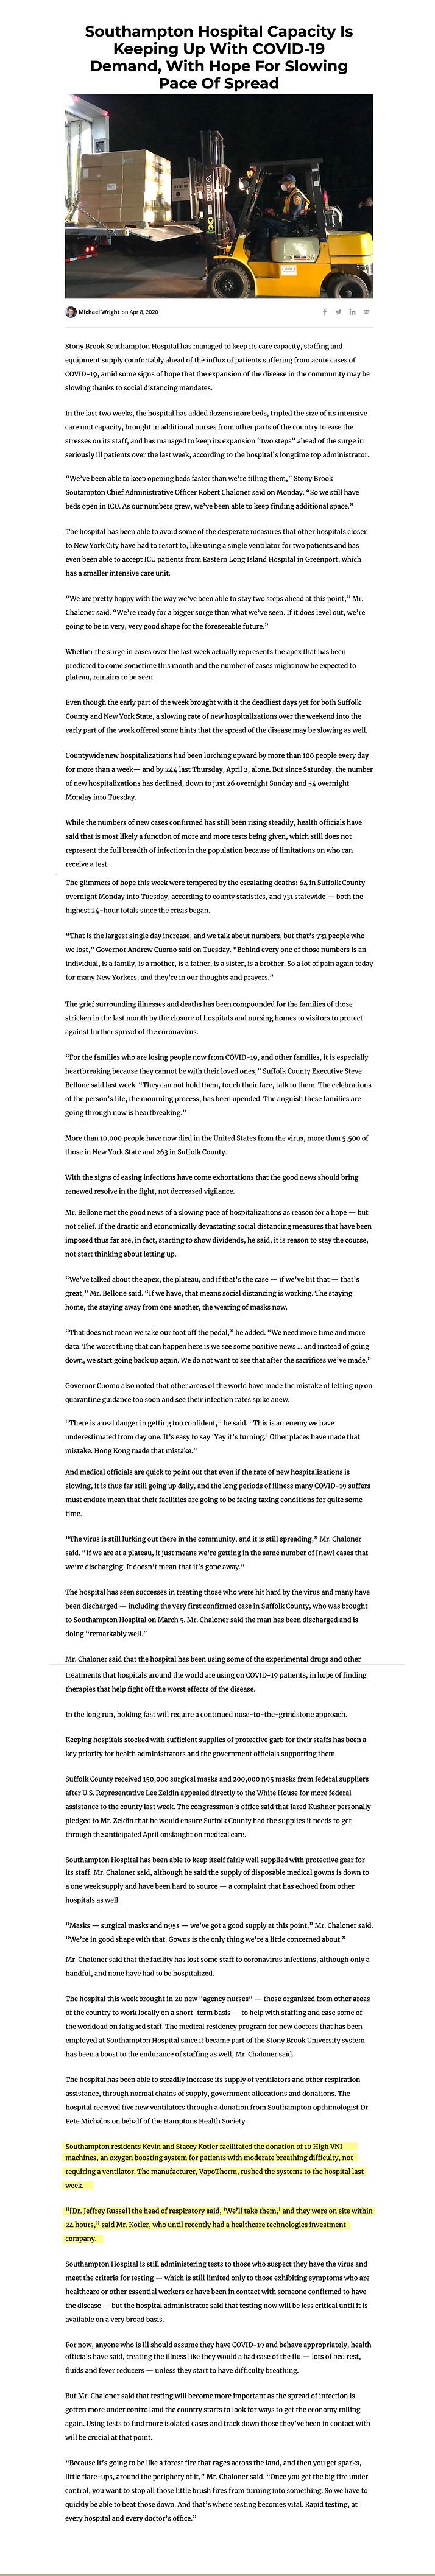 press_page2 copy.jpg